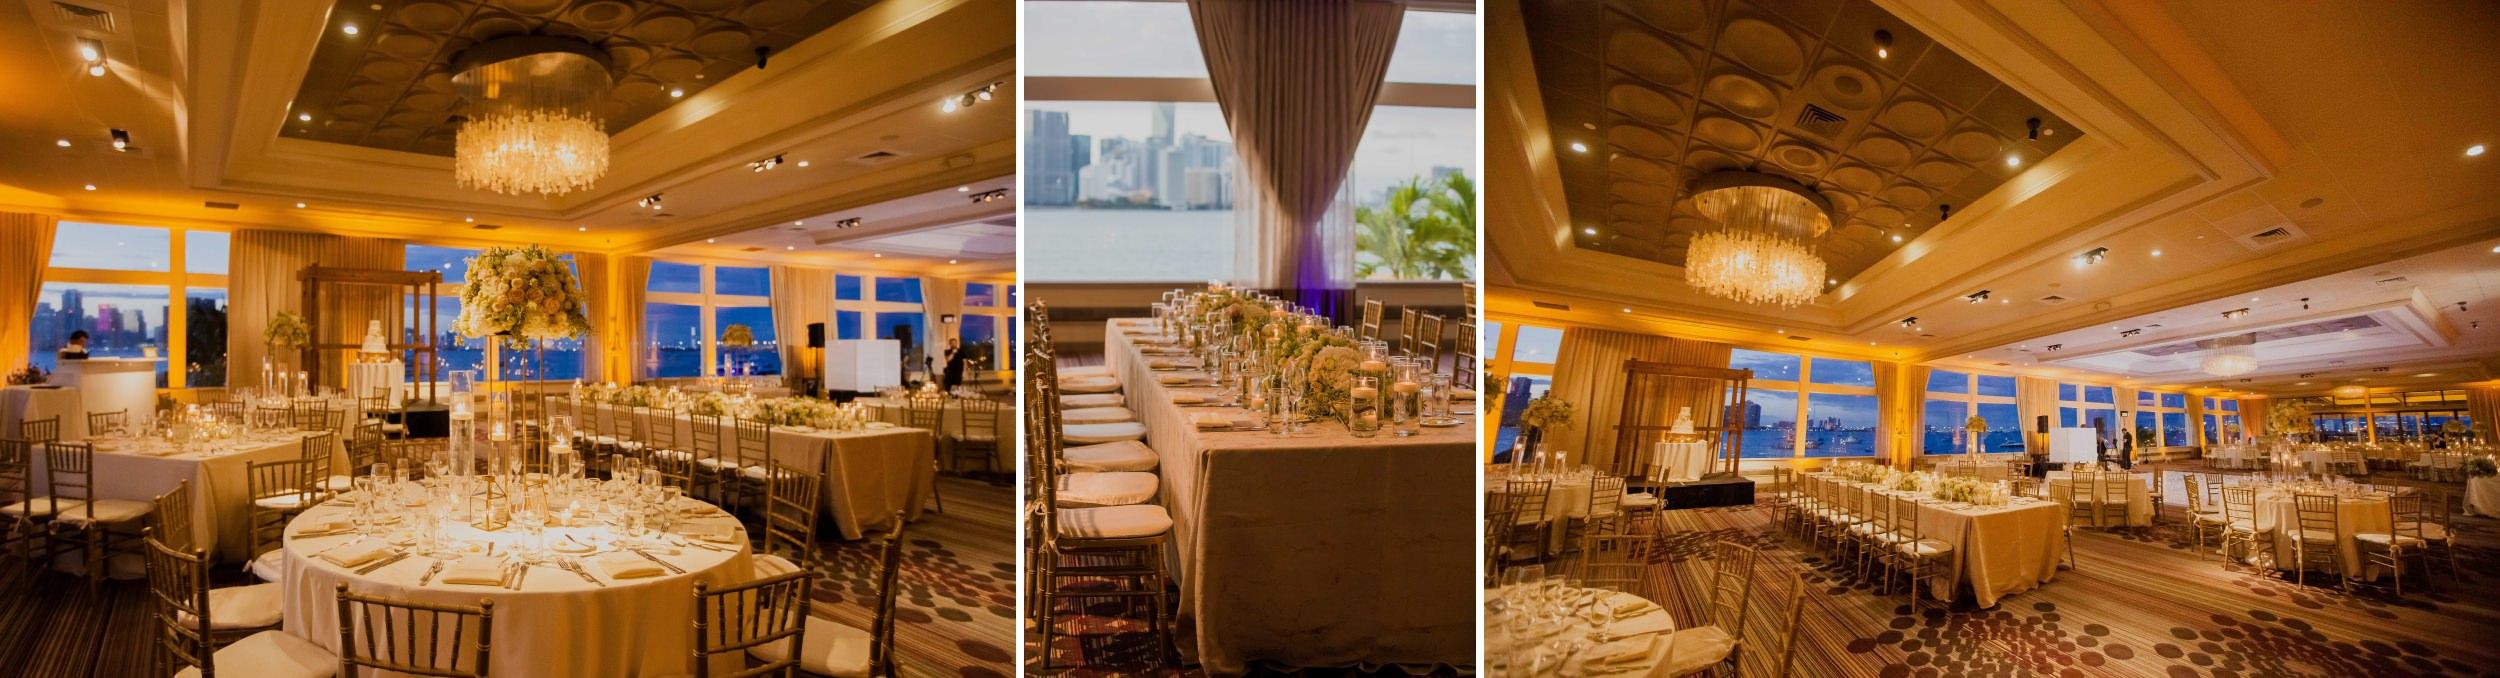 Wedding - Rusty Pelican - Key Biscayne - Santy Martinez Photography 36.jpg